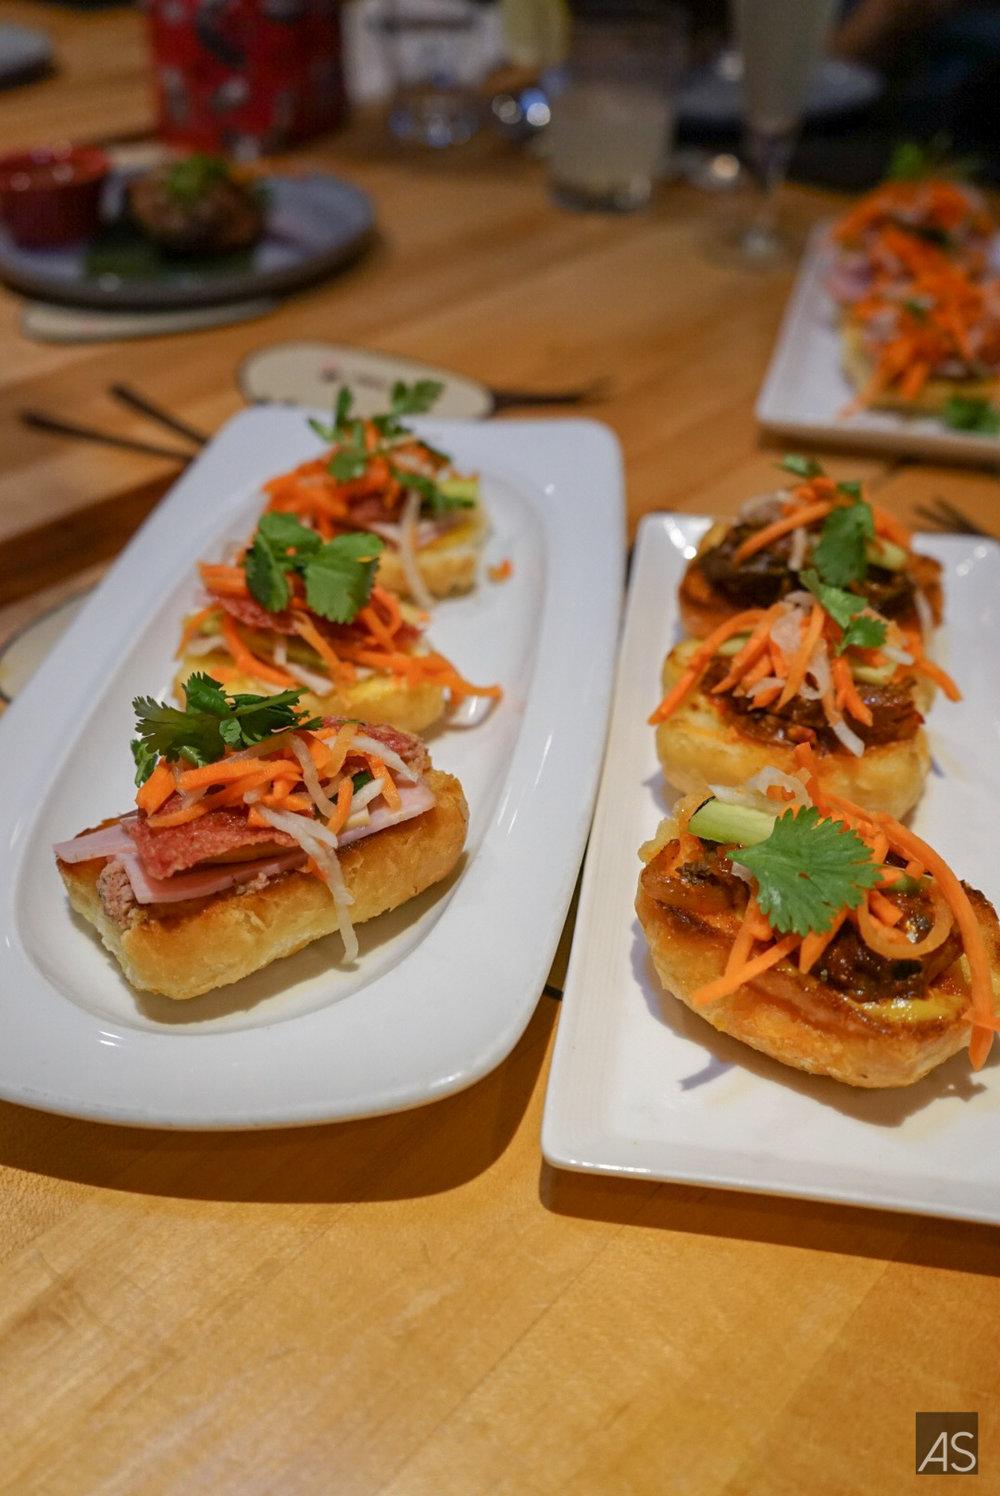 Banh Mi Dac Biet | Ham | Viet Mortadella | smoke salami | Pate| house mayo | pickled daikon & carrot  Banh Mi Ca| Sardines stewed in tomato sauce | onions | house mayo | pickled daikon & carrot